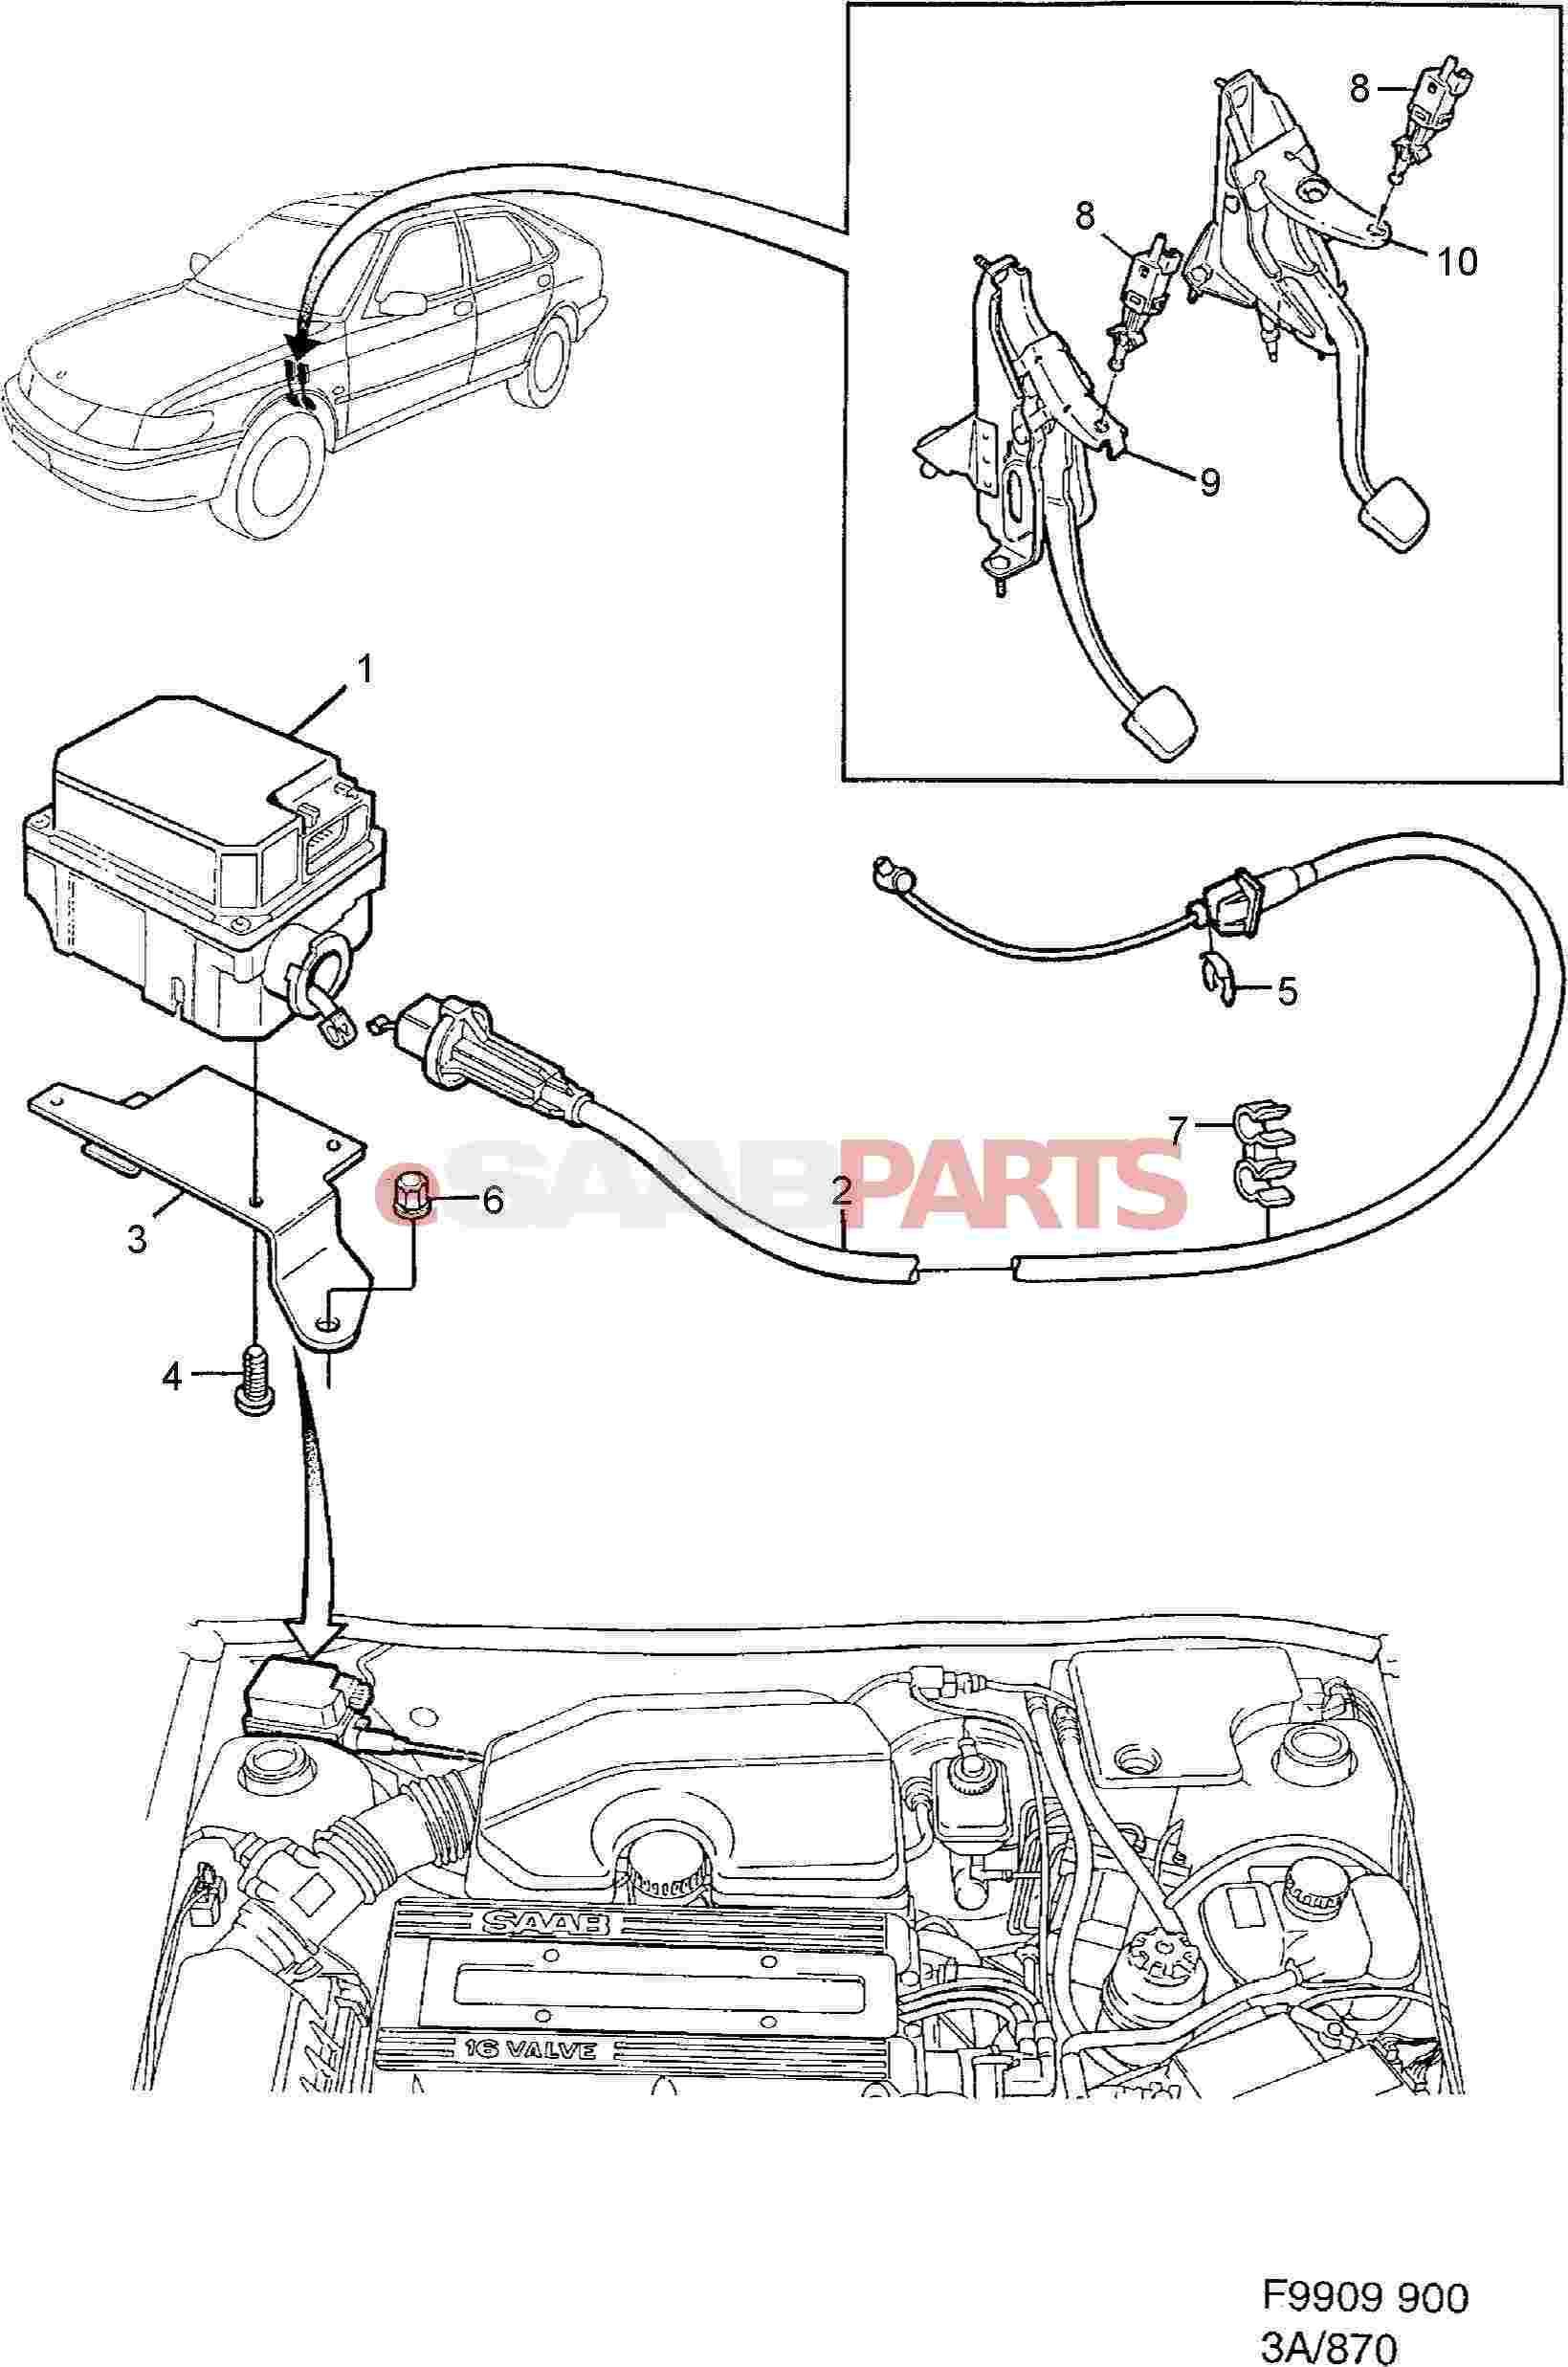 Awe Inspiring 4947099 Saab Pedel Contact Genuine Saab Parts From Esaabparts Com Wiring Cloud Lukepaidewilluminateatxorg